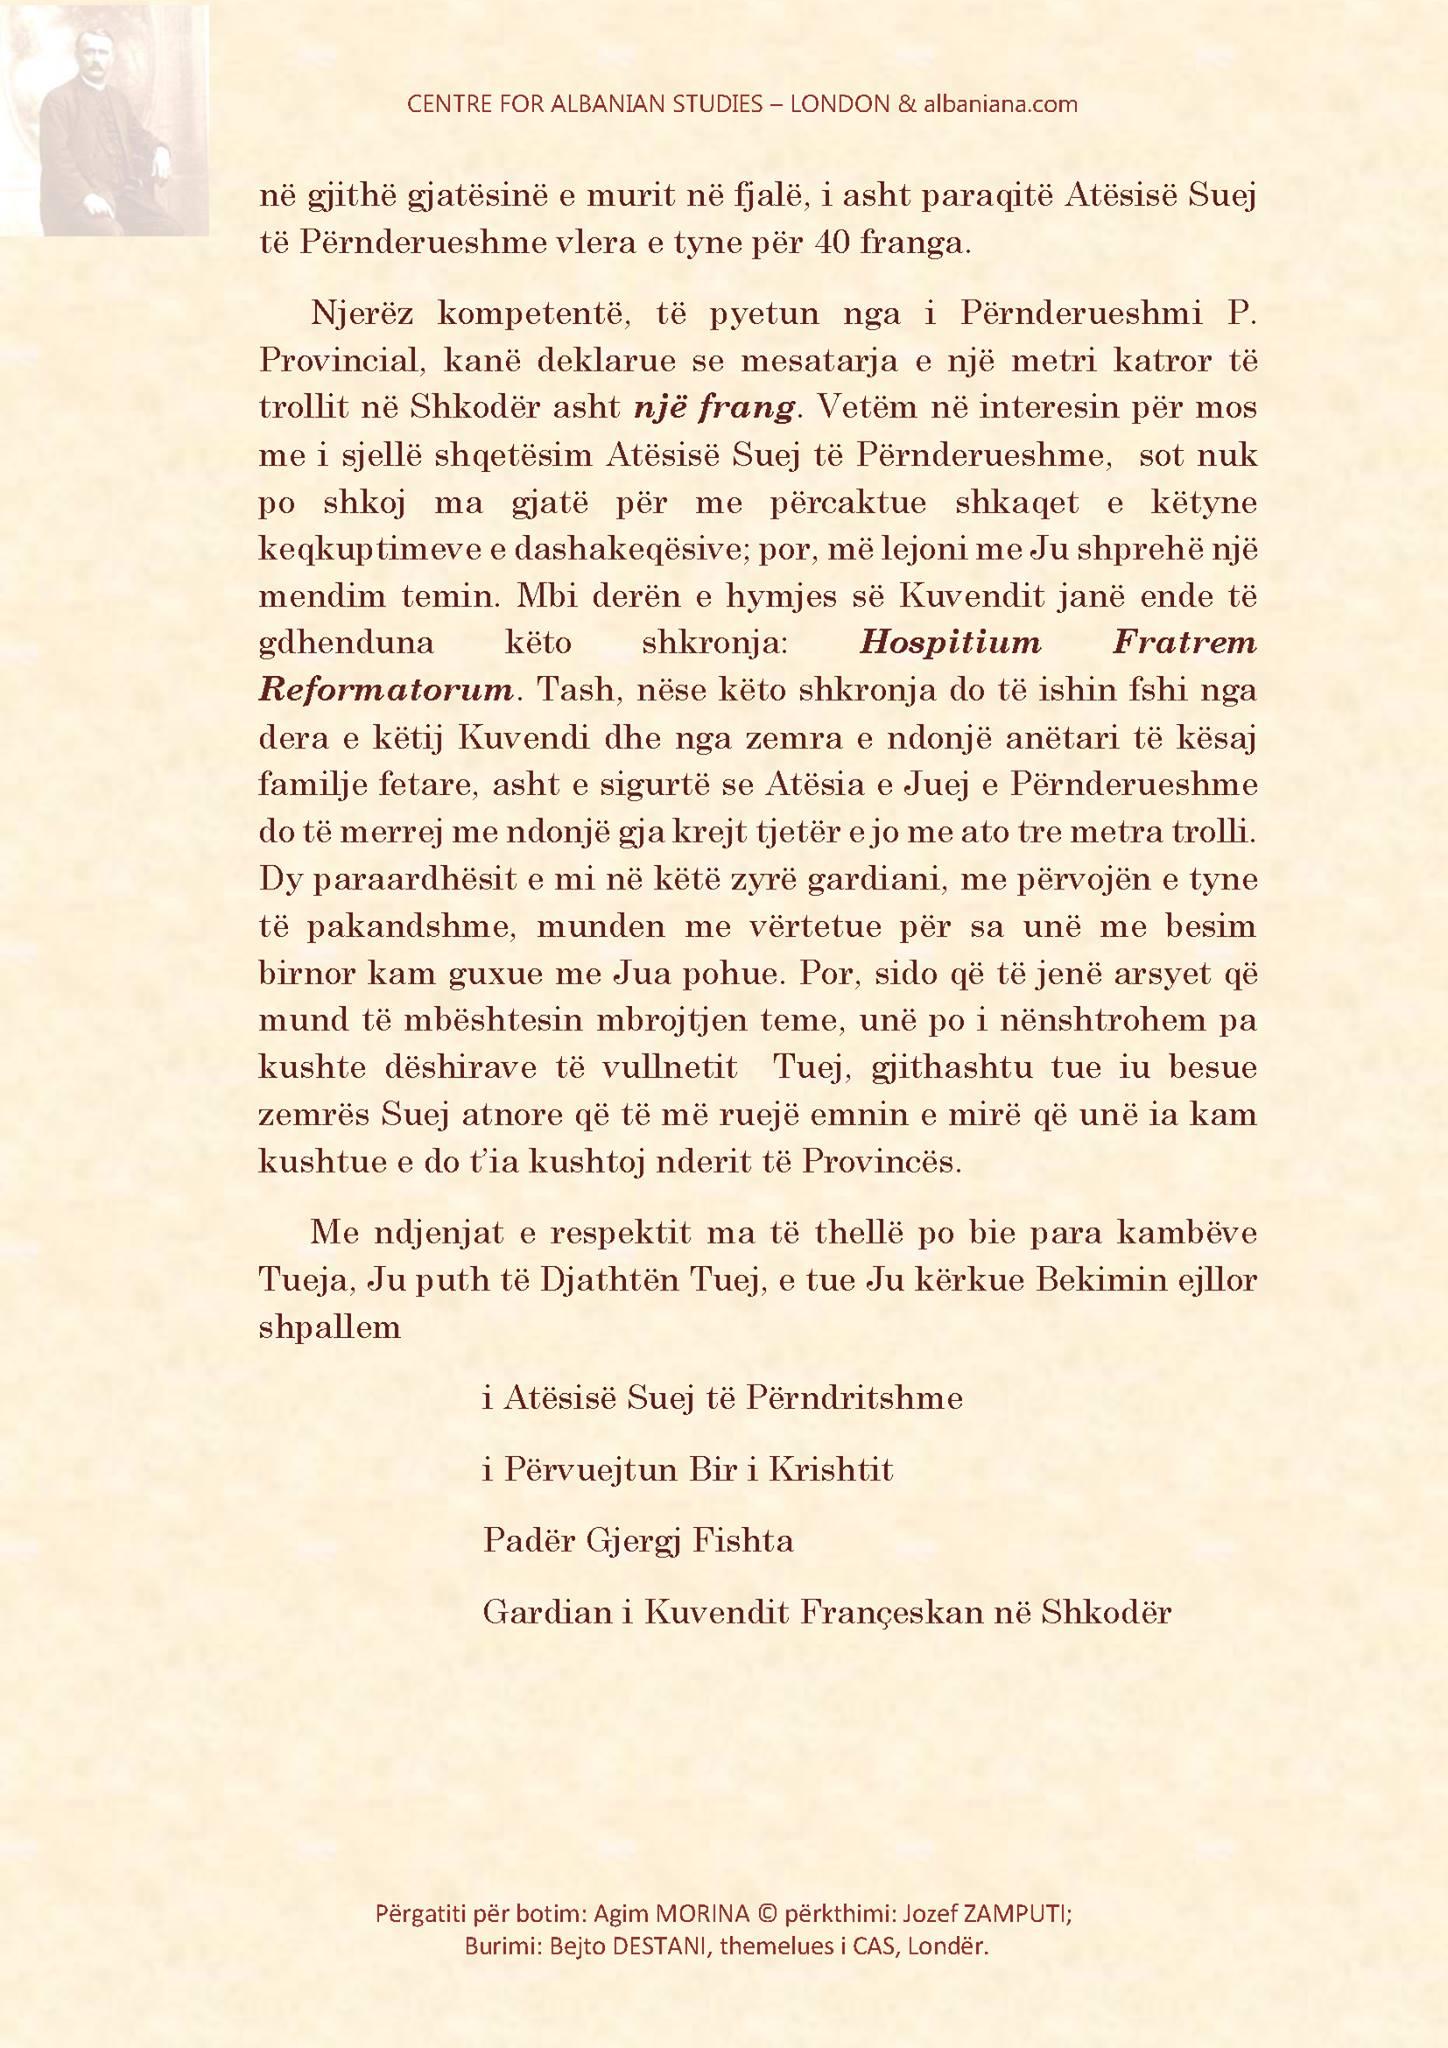 1908-05-12_fishta-3